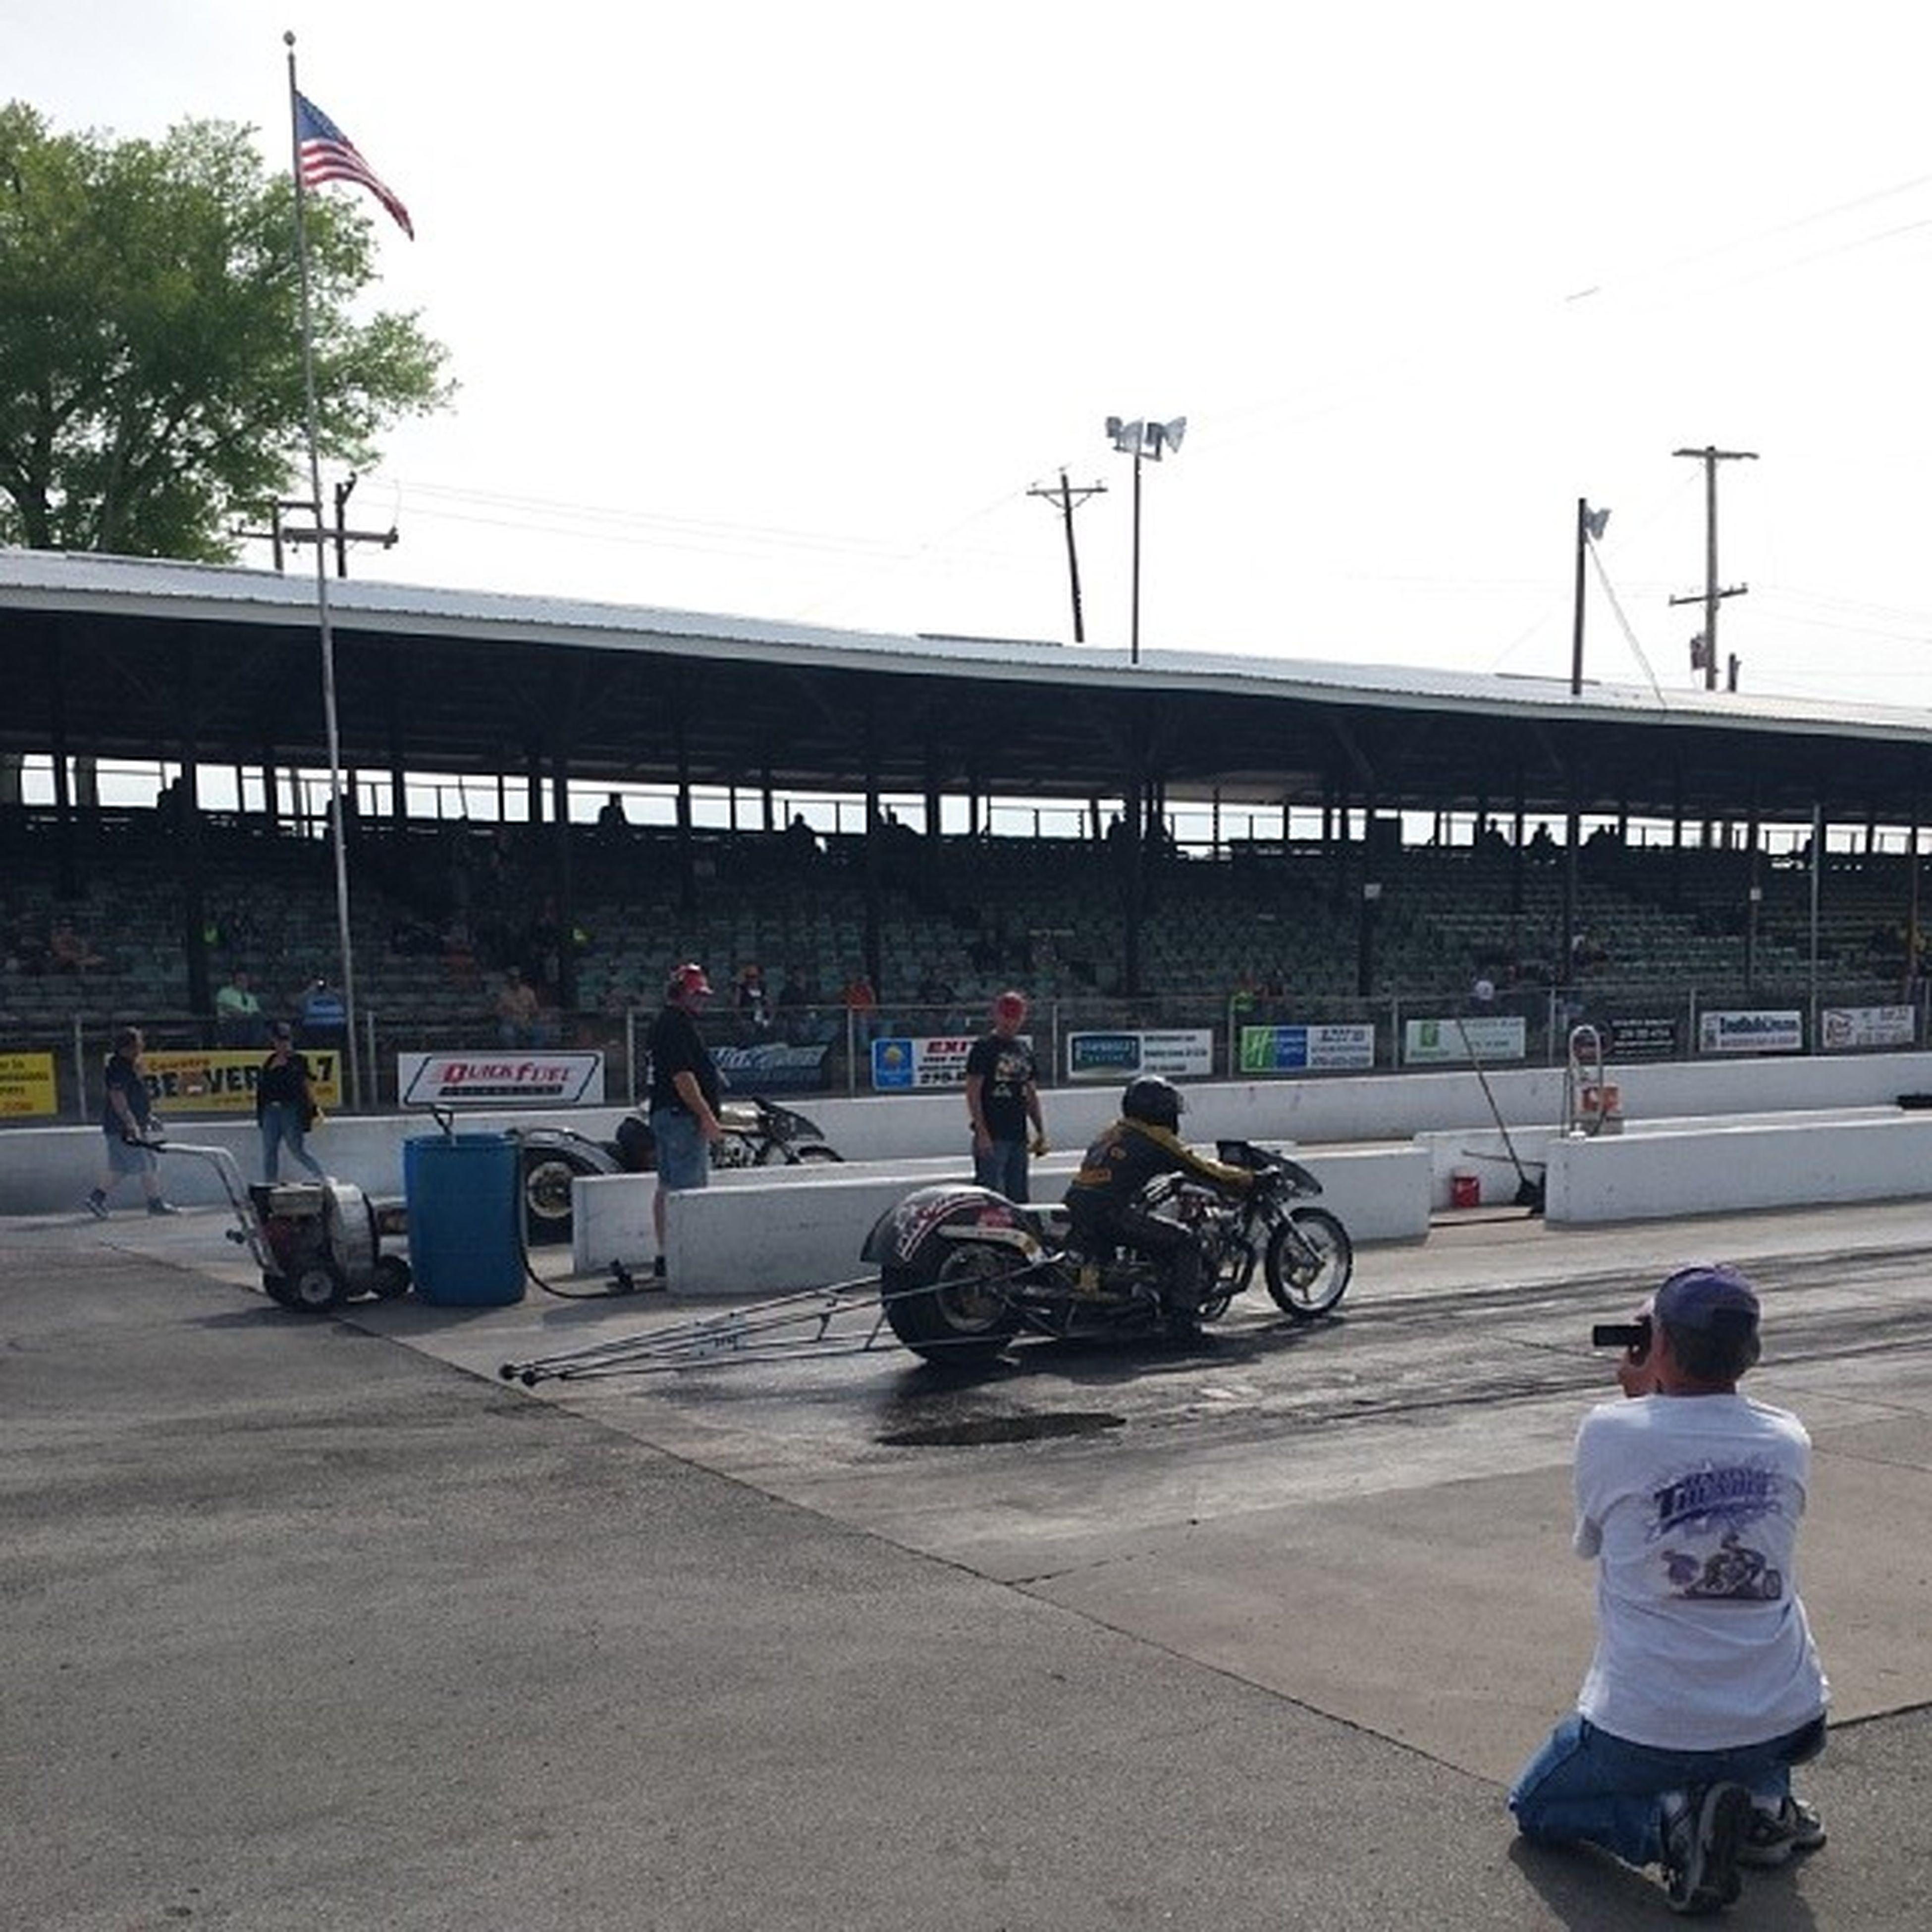 168 mph. What Dragracing Harleydavidson